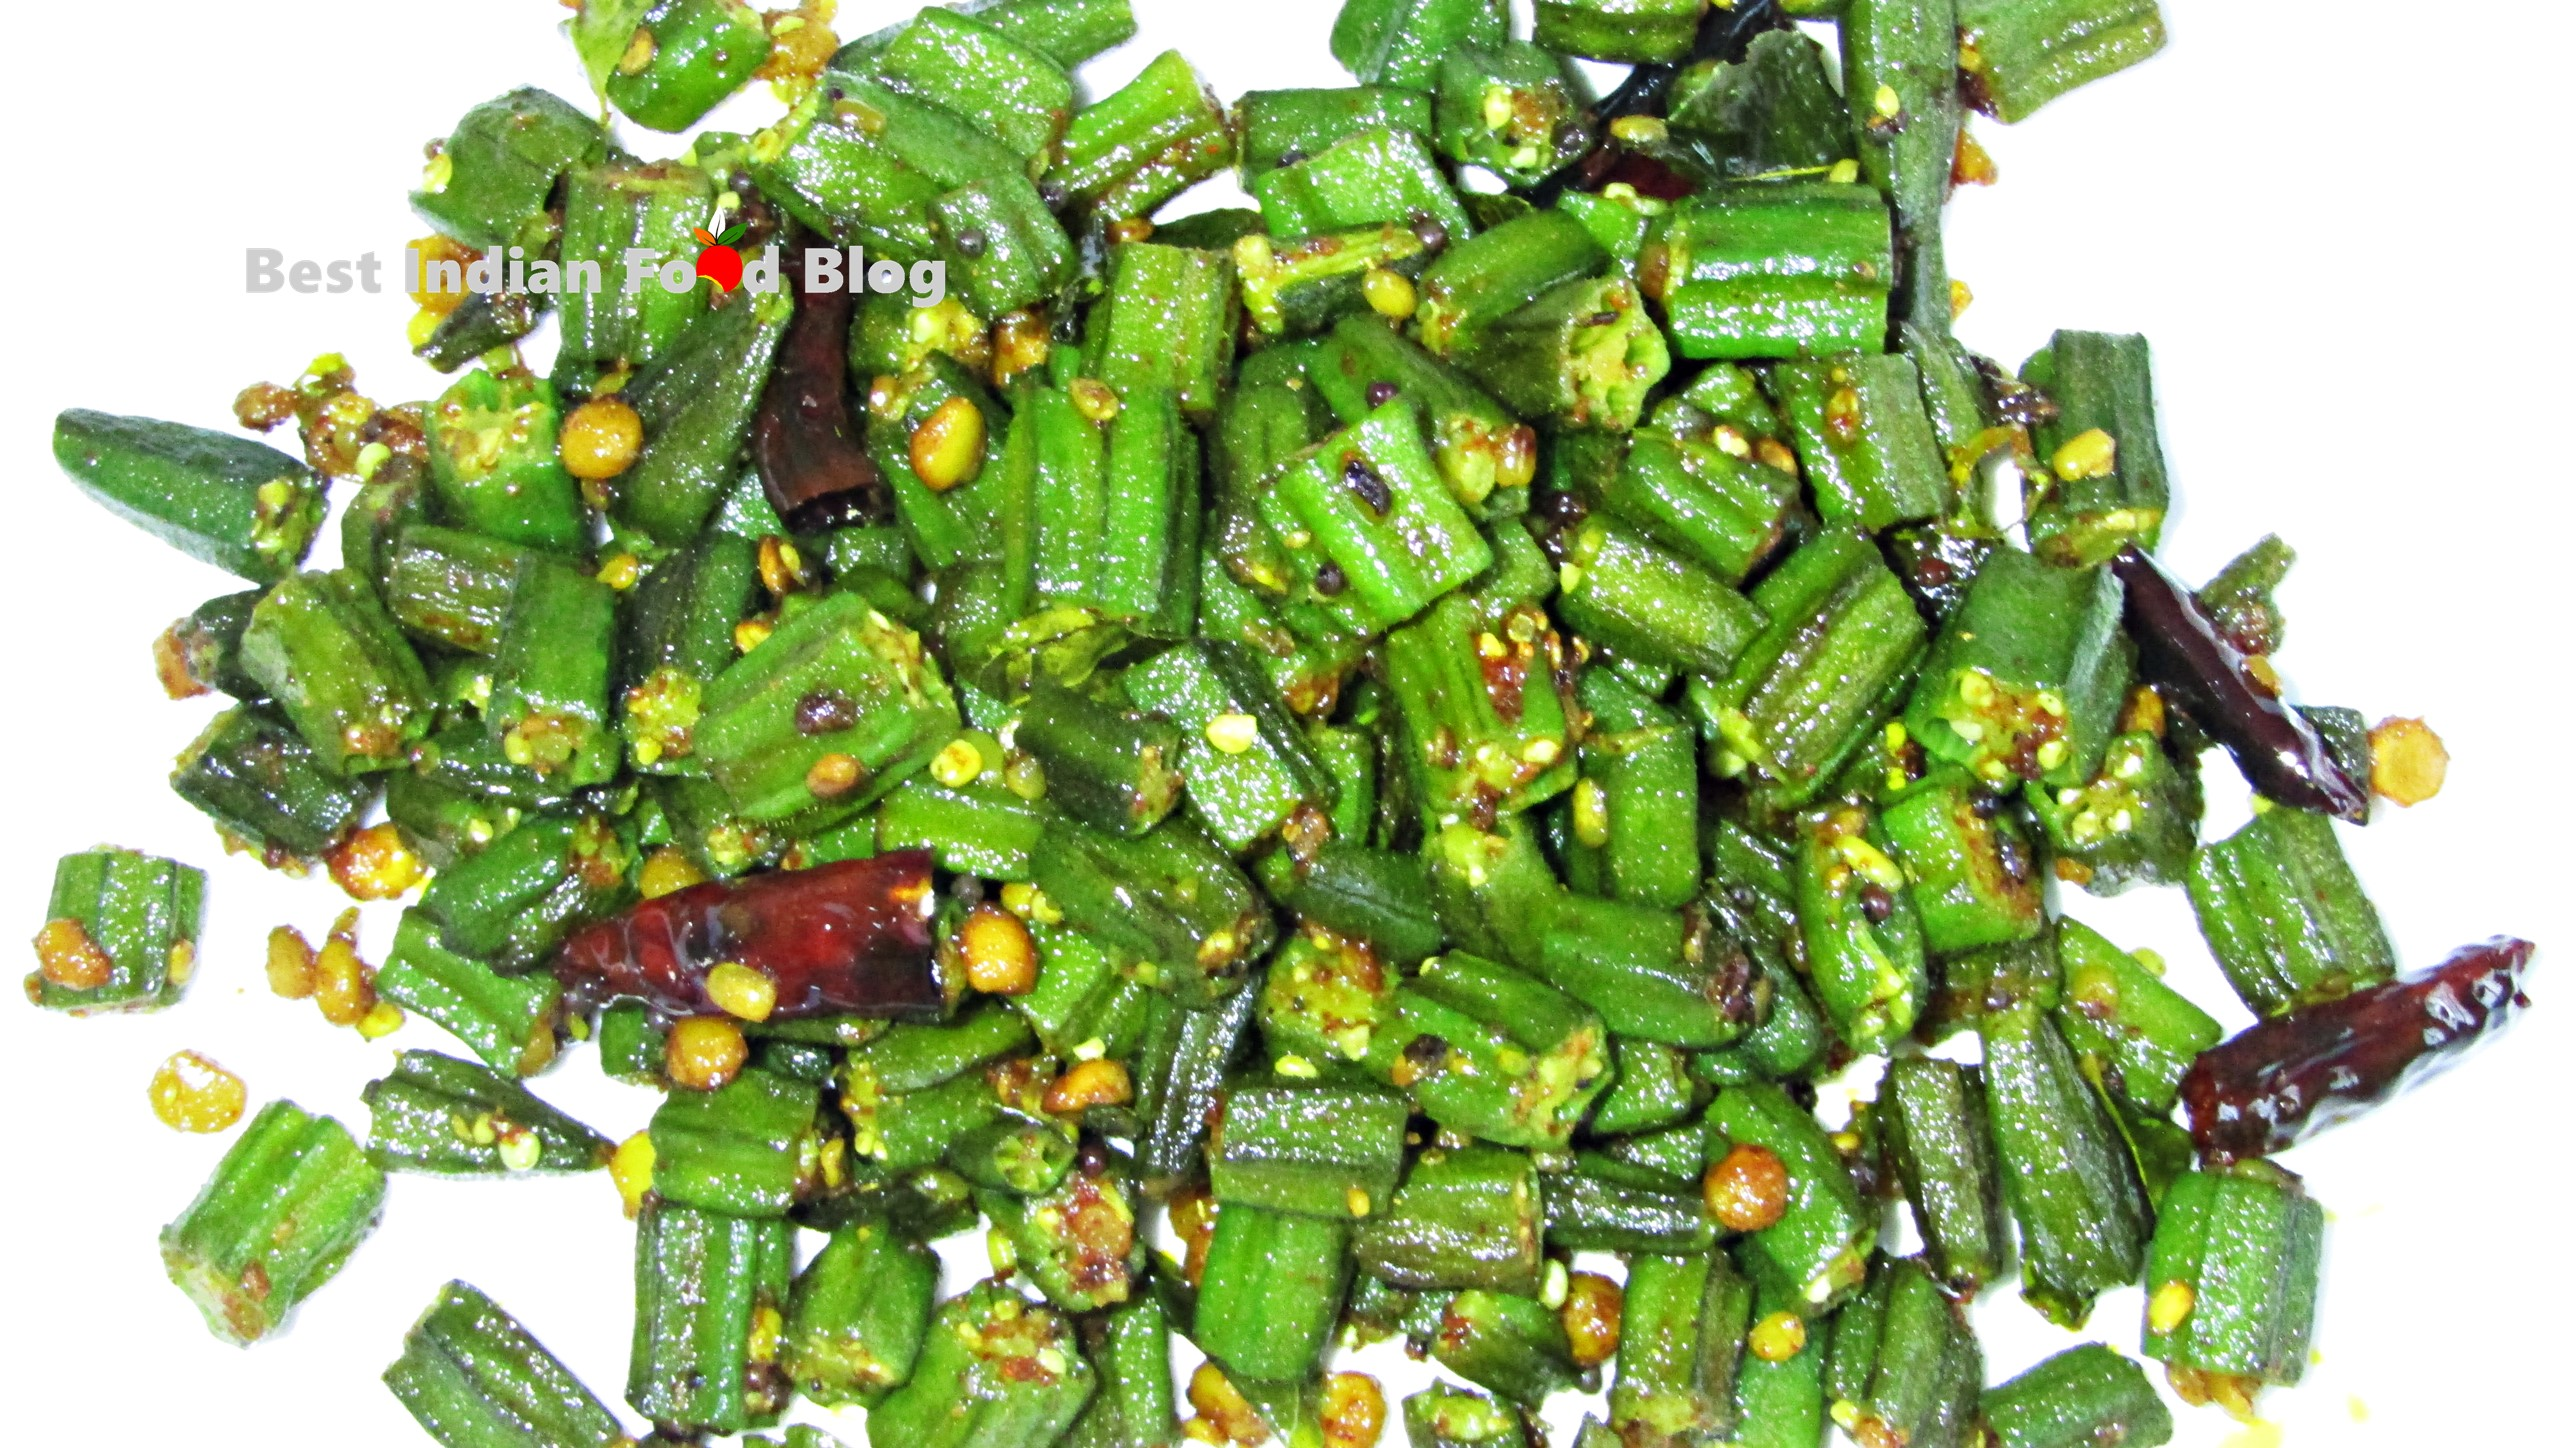 Vendakkai Poriyal from Puducherry, India | Best Indian Food Blog